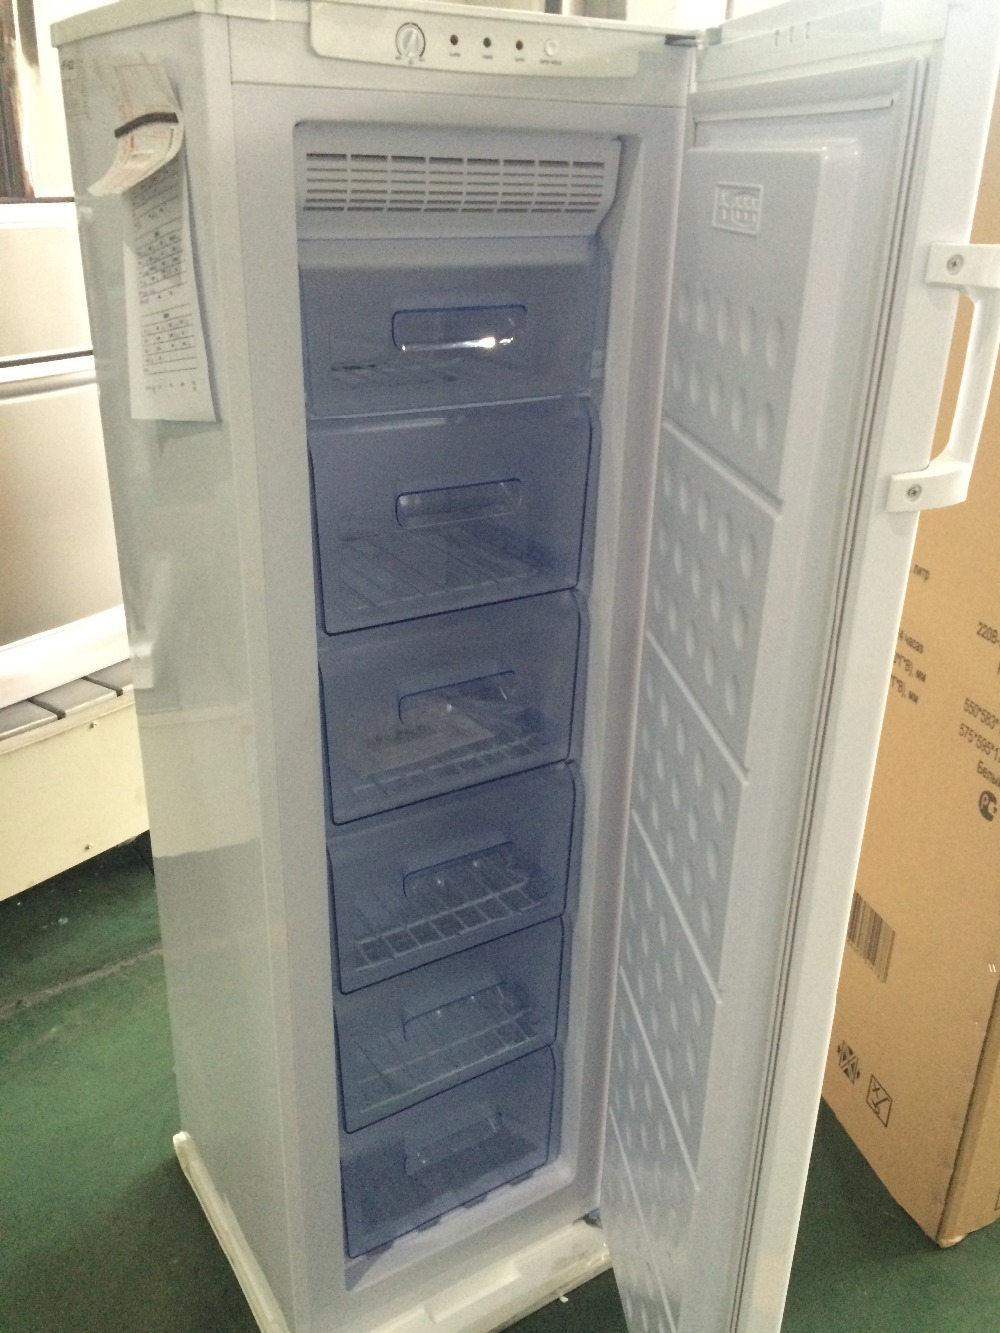 frost mini upright freezers vertical deep freezer with drawers - Upright Deep Freezer